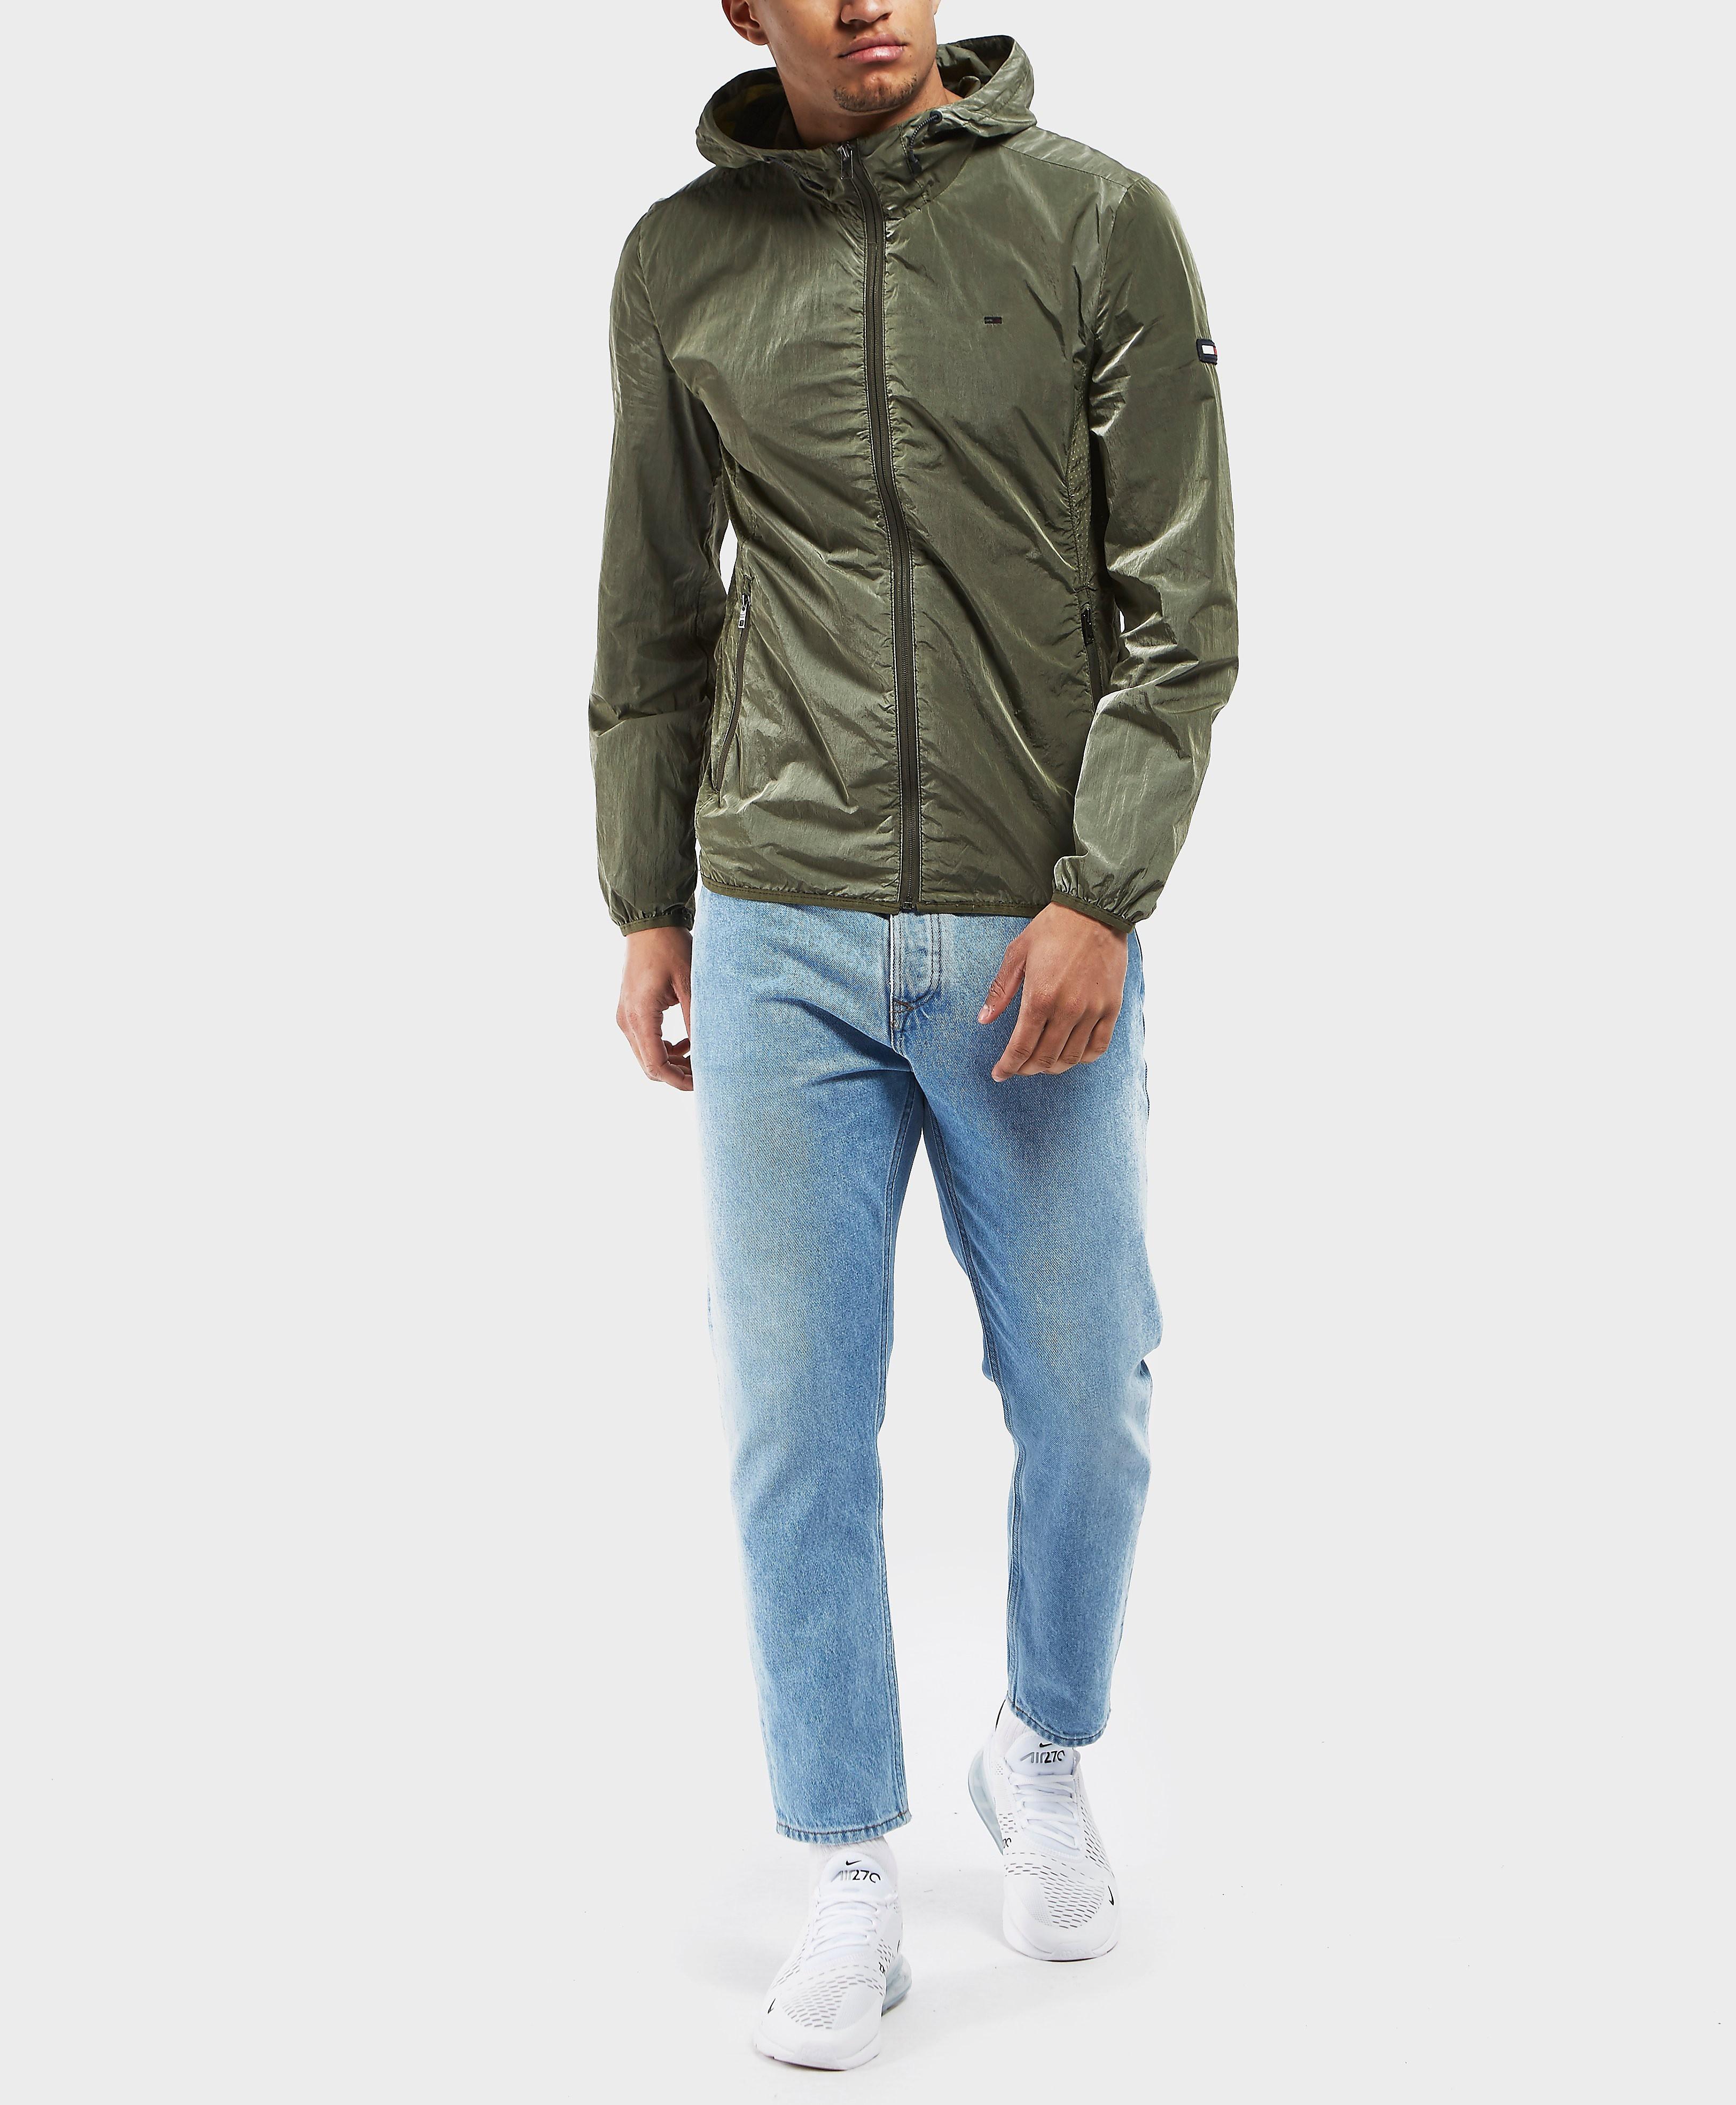 Tommy Hilfiger Garment Dyed Lightweight Jacket